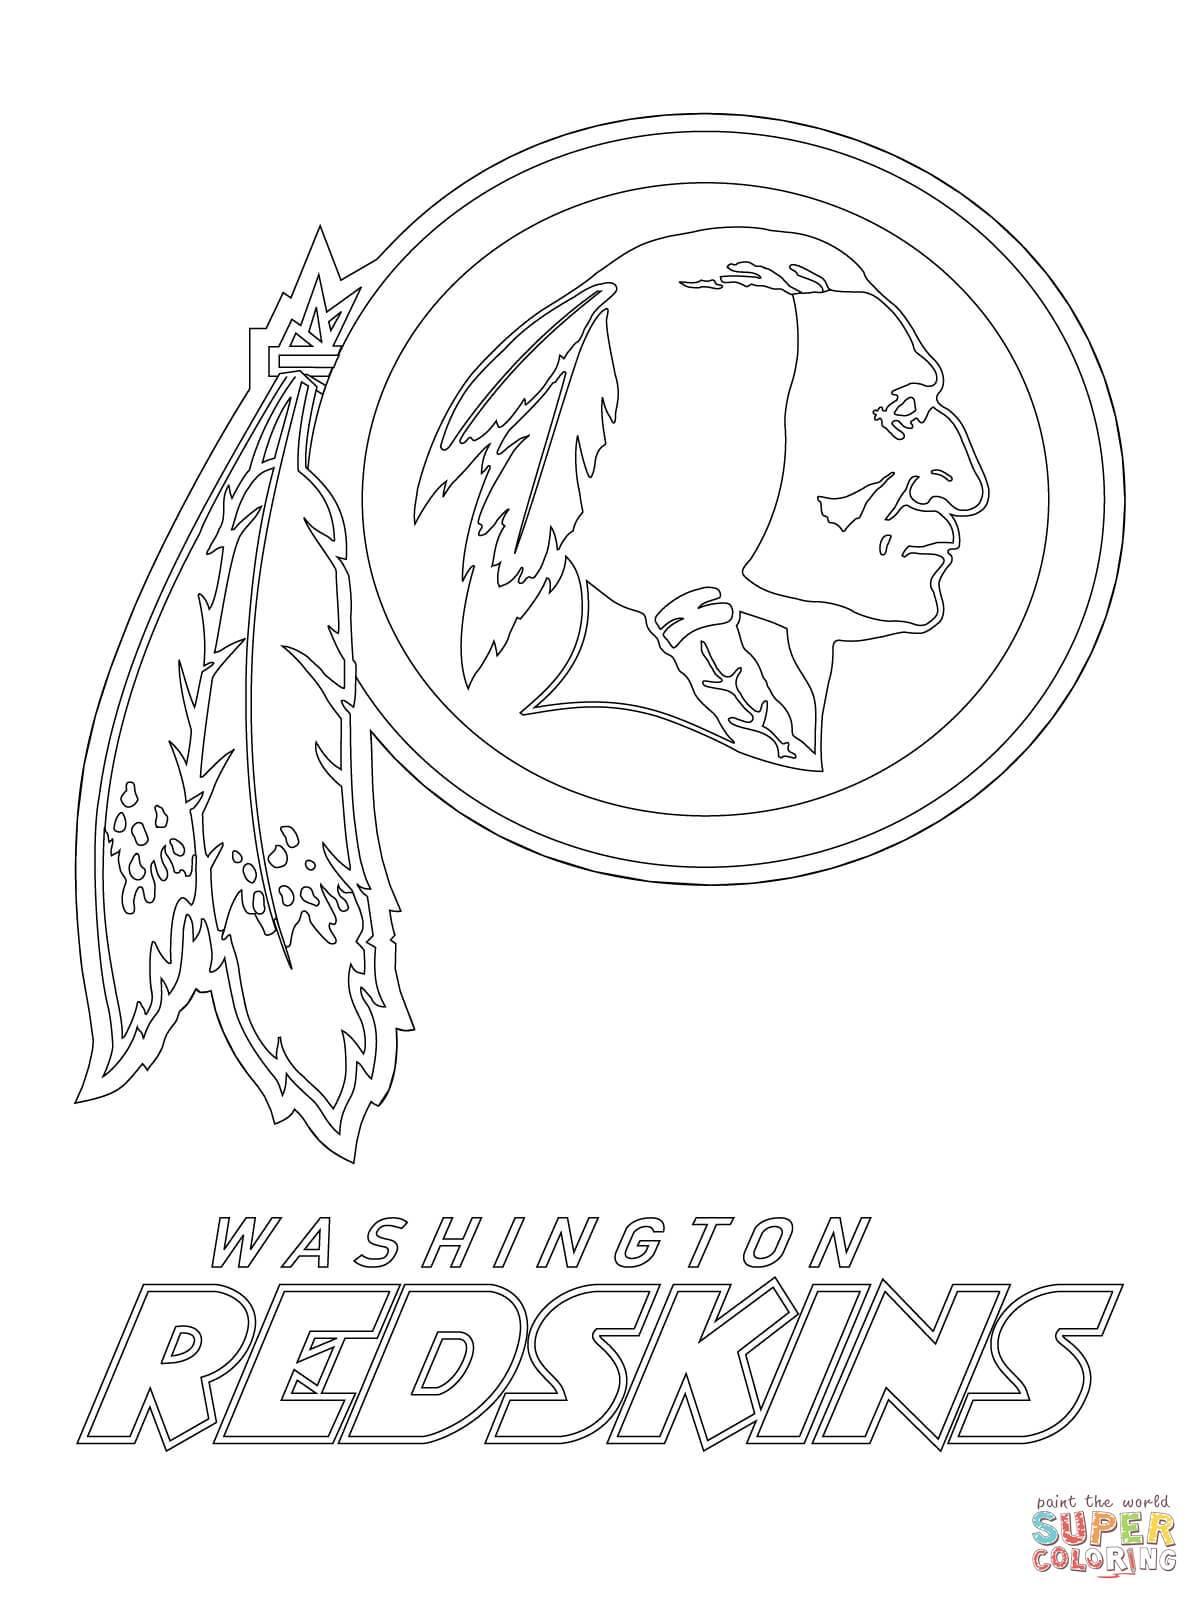 seattle seahawks helmet coloring page free seattle seahawks coloring pages seattle seahawks helmet seattle seahawks coloring page